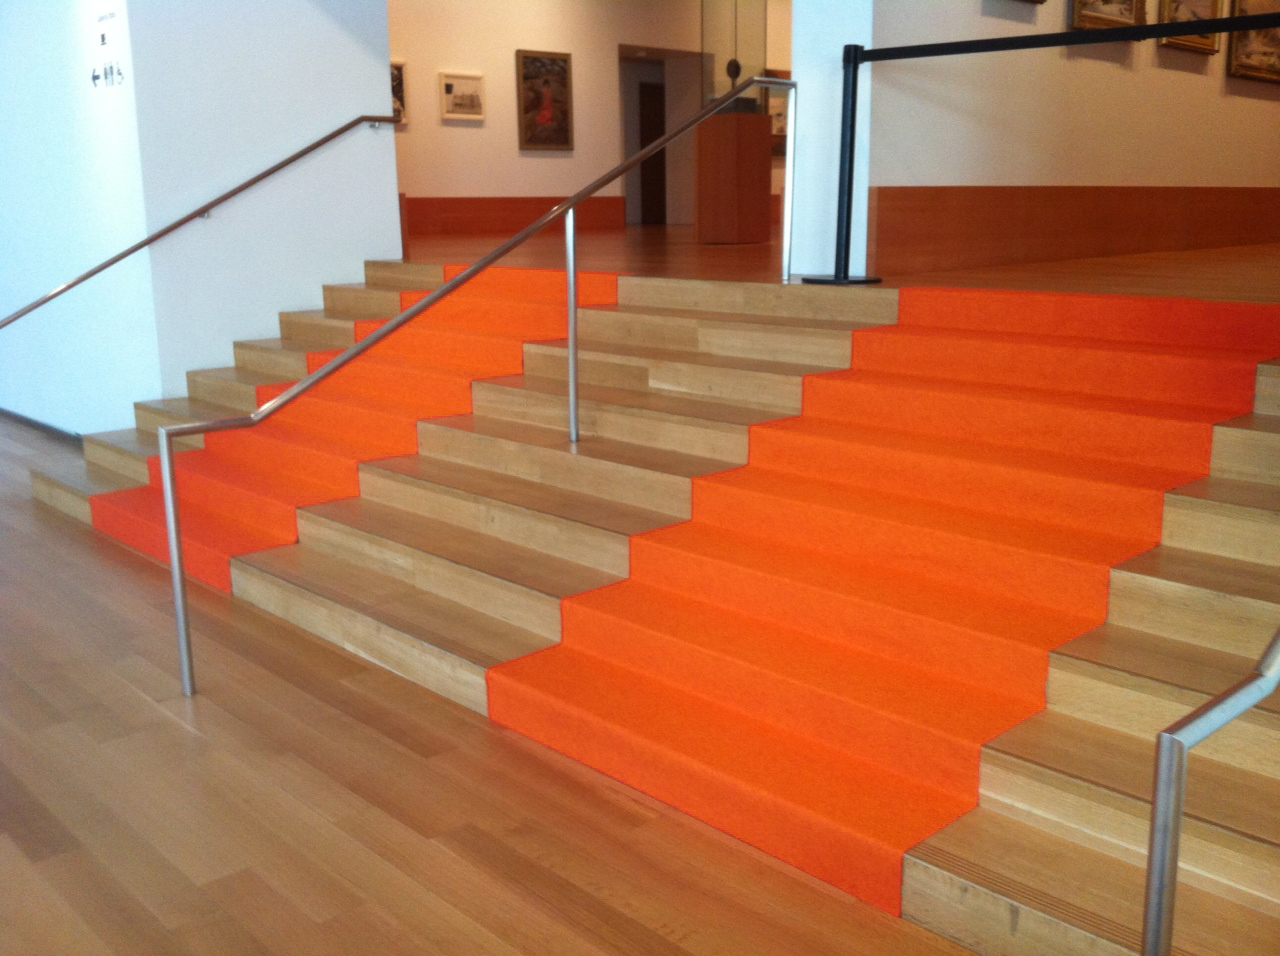 Orange event carpet runner installed on stairs